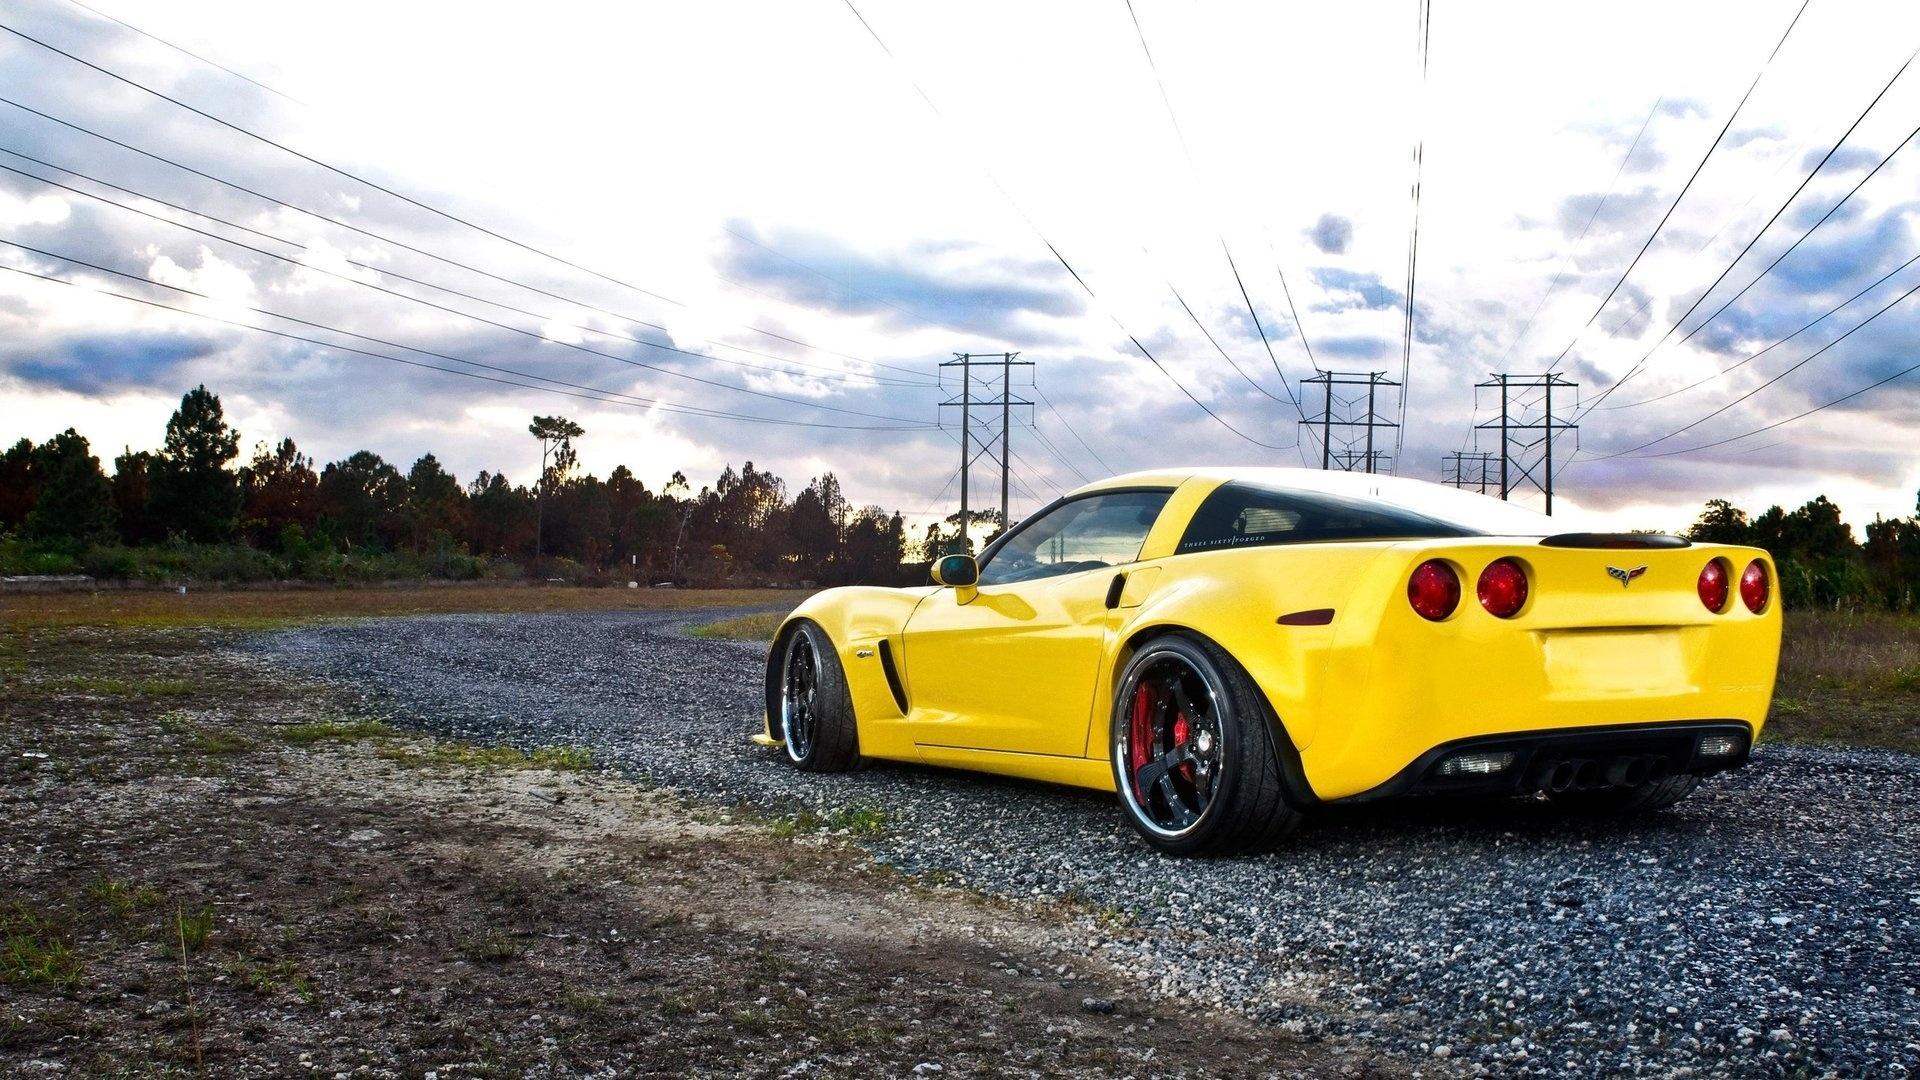 Corvette desktop background